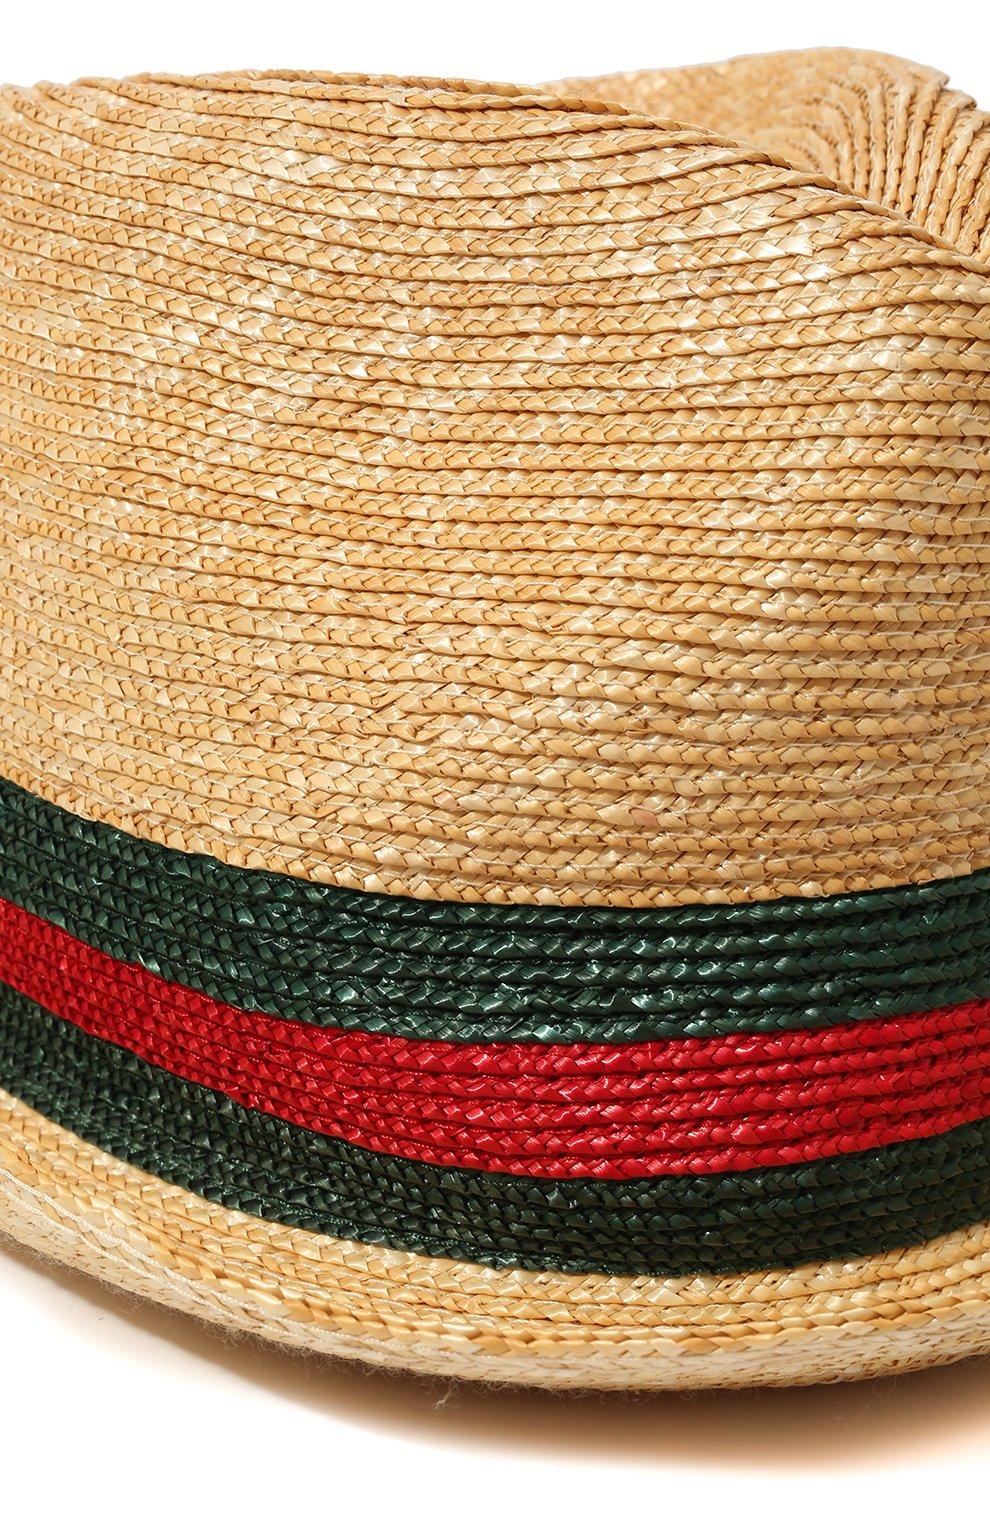 Плетеная шляпа | Фото №3